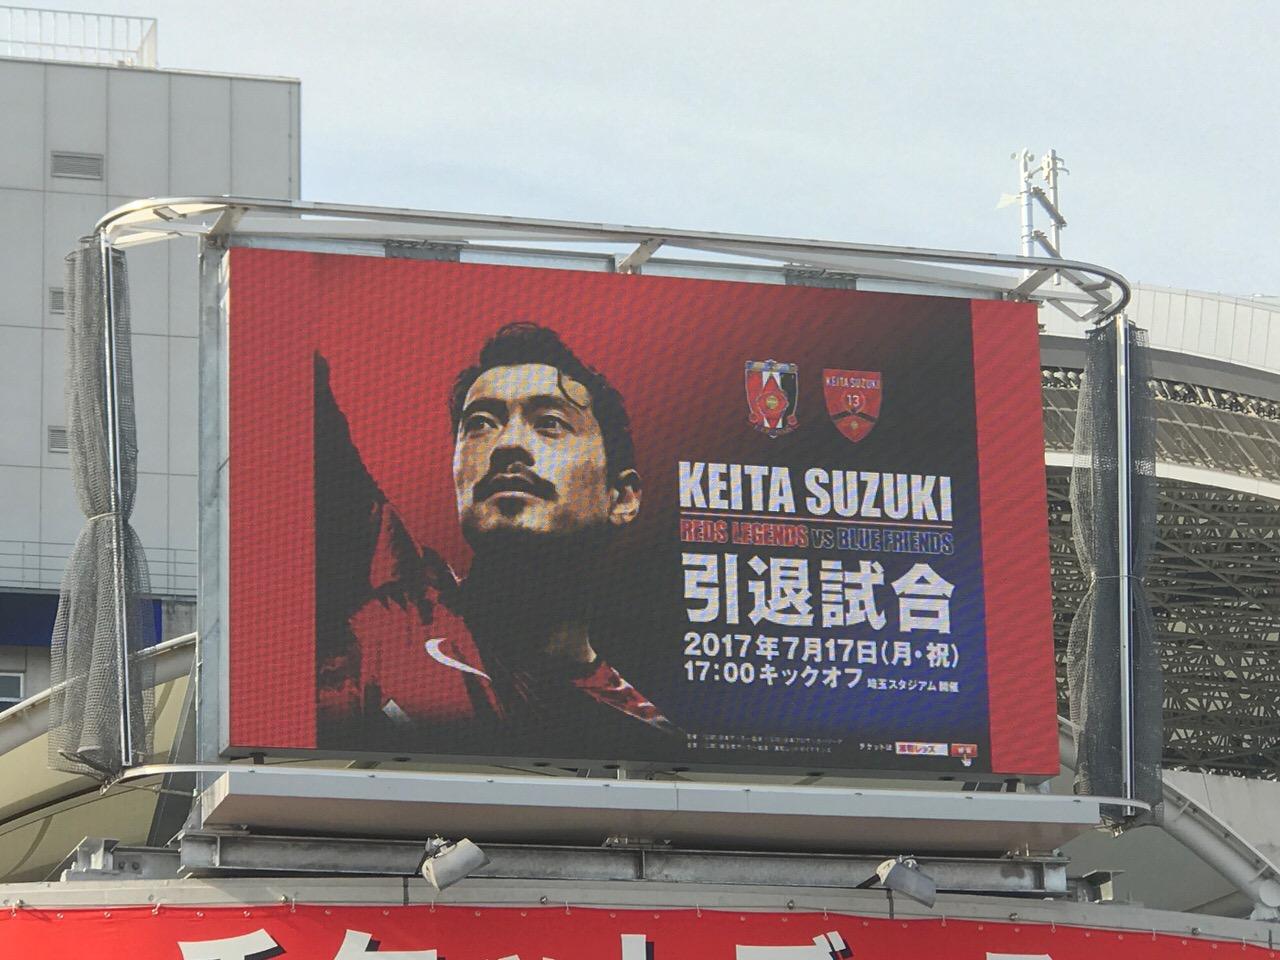 Suzukikeita 4738